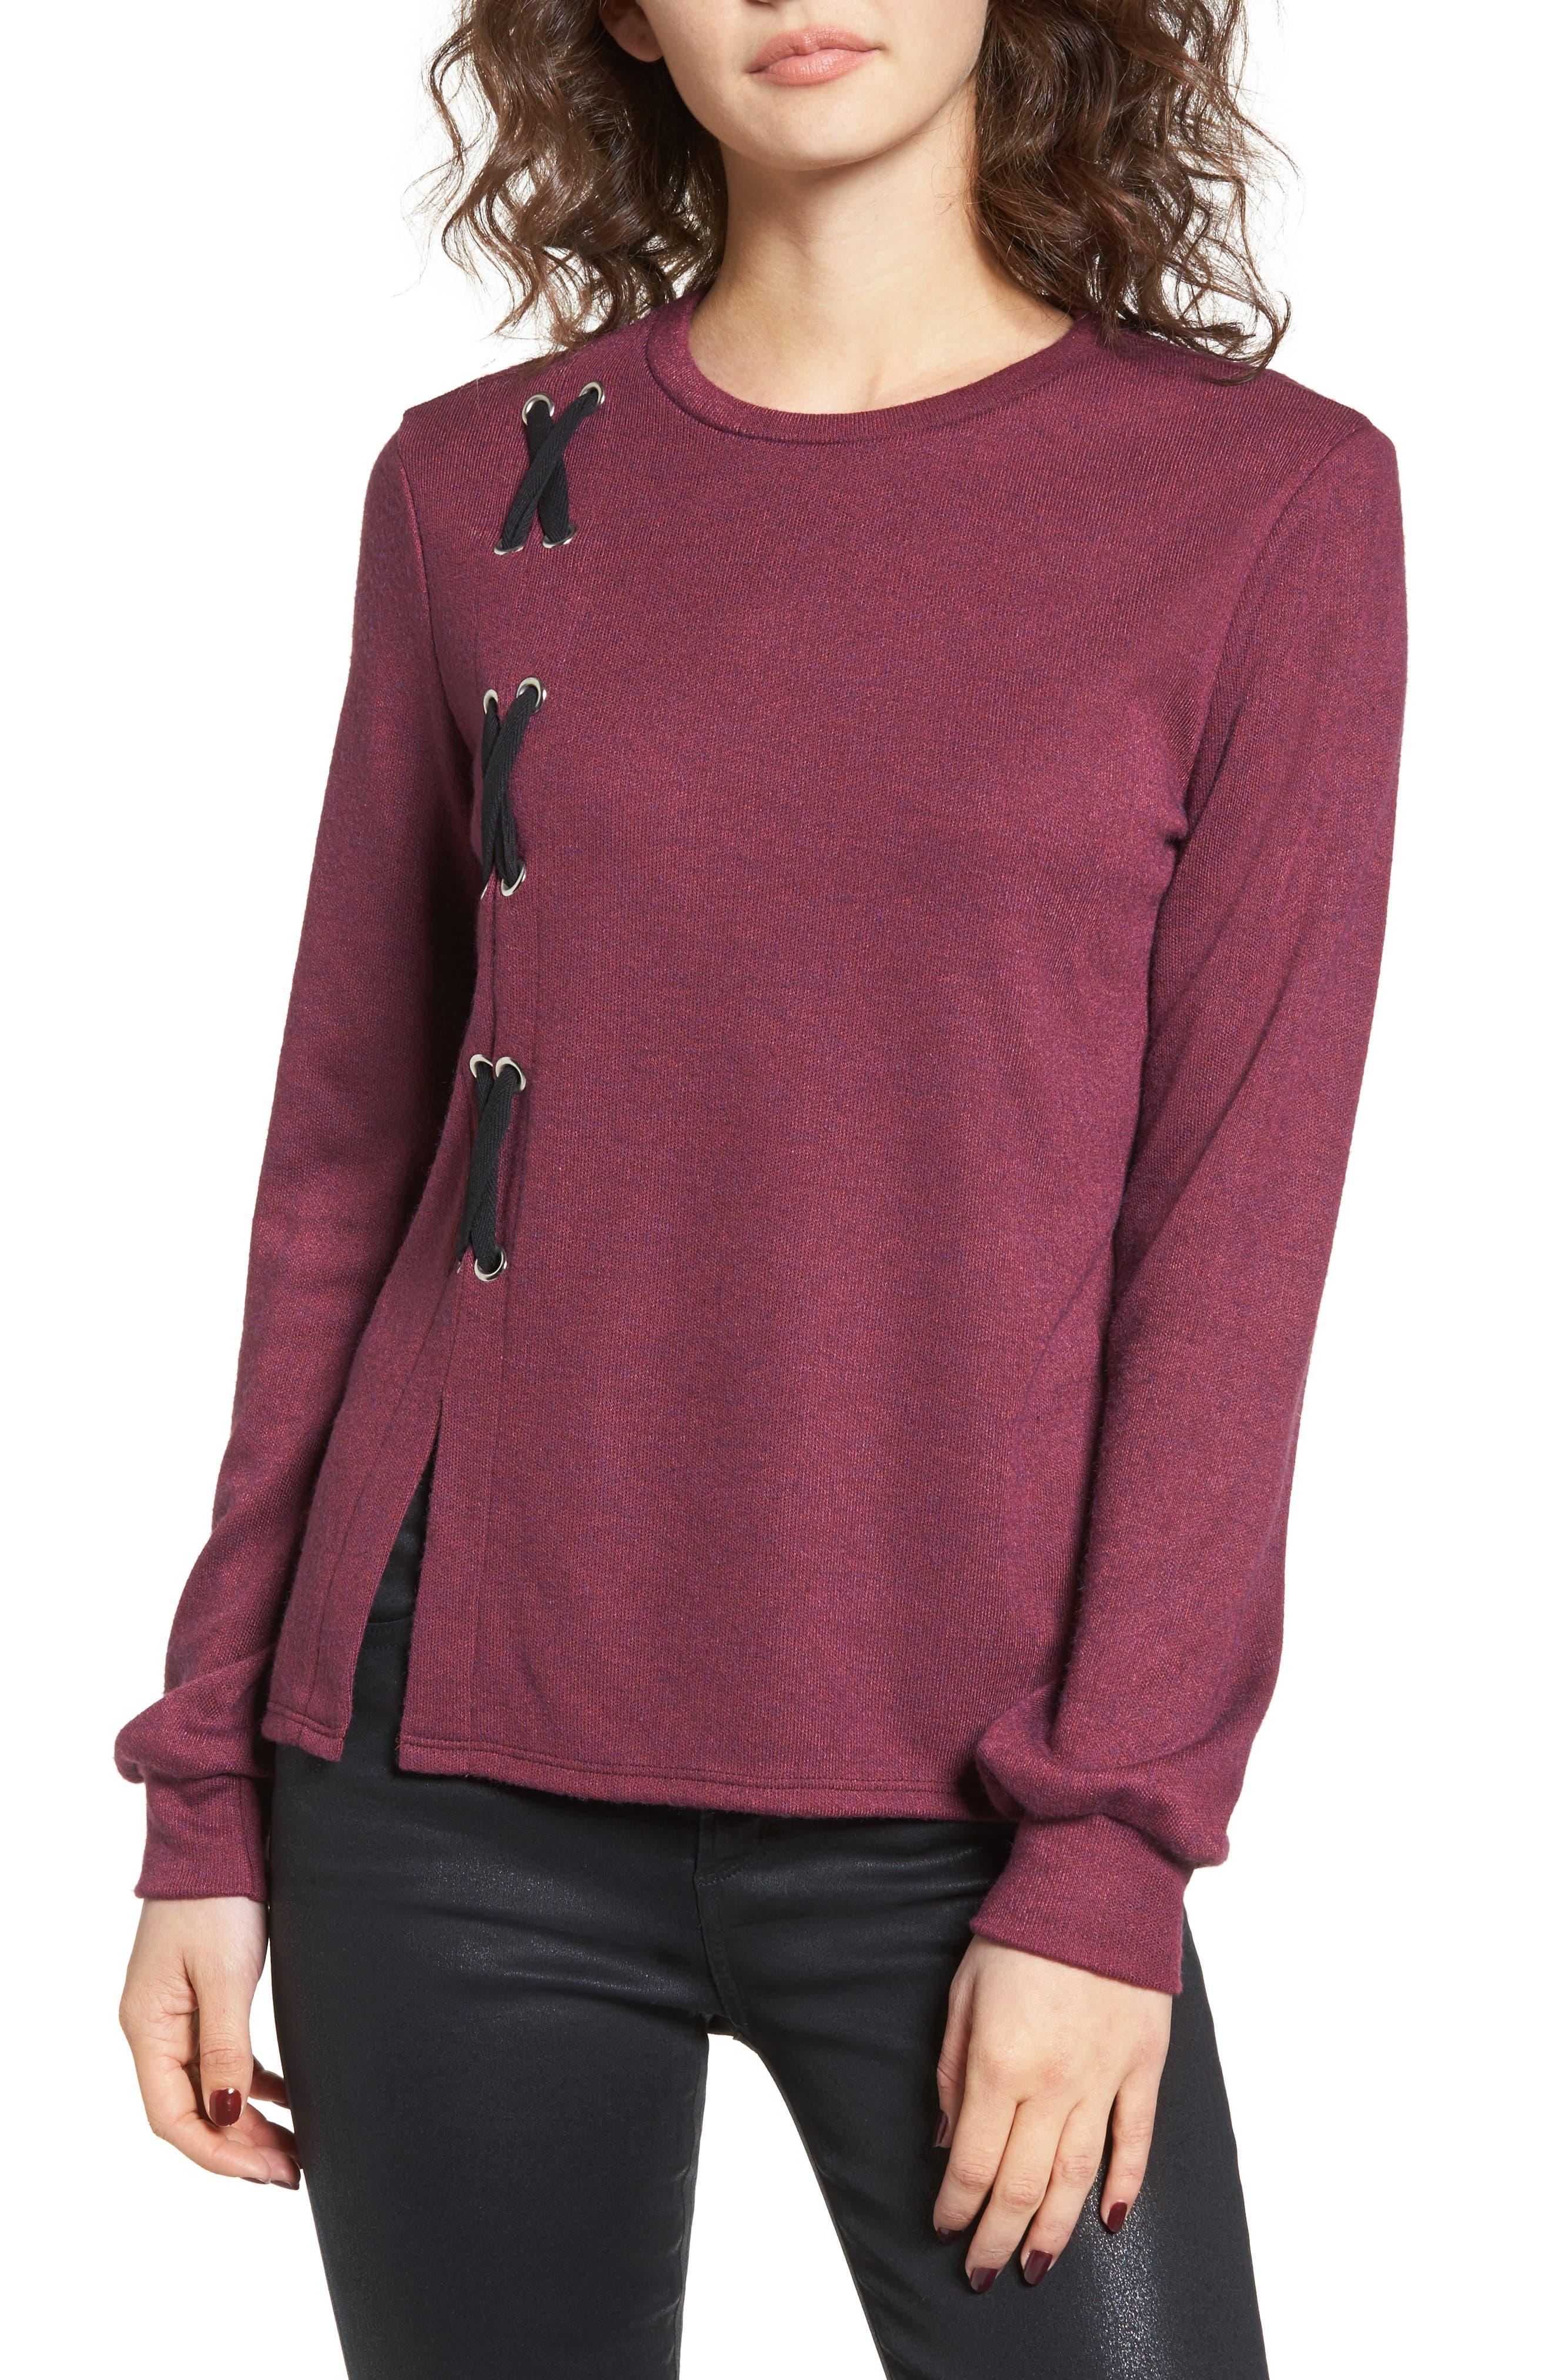 Main Image - WAYF Lace-Up Sweater